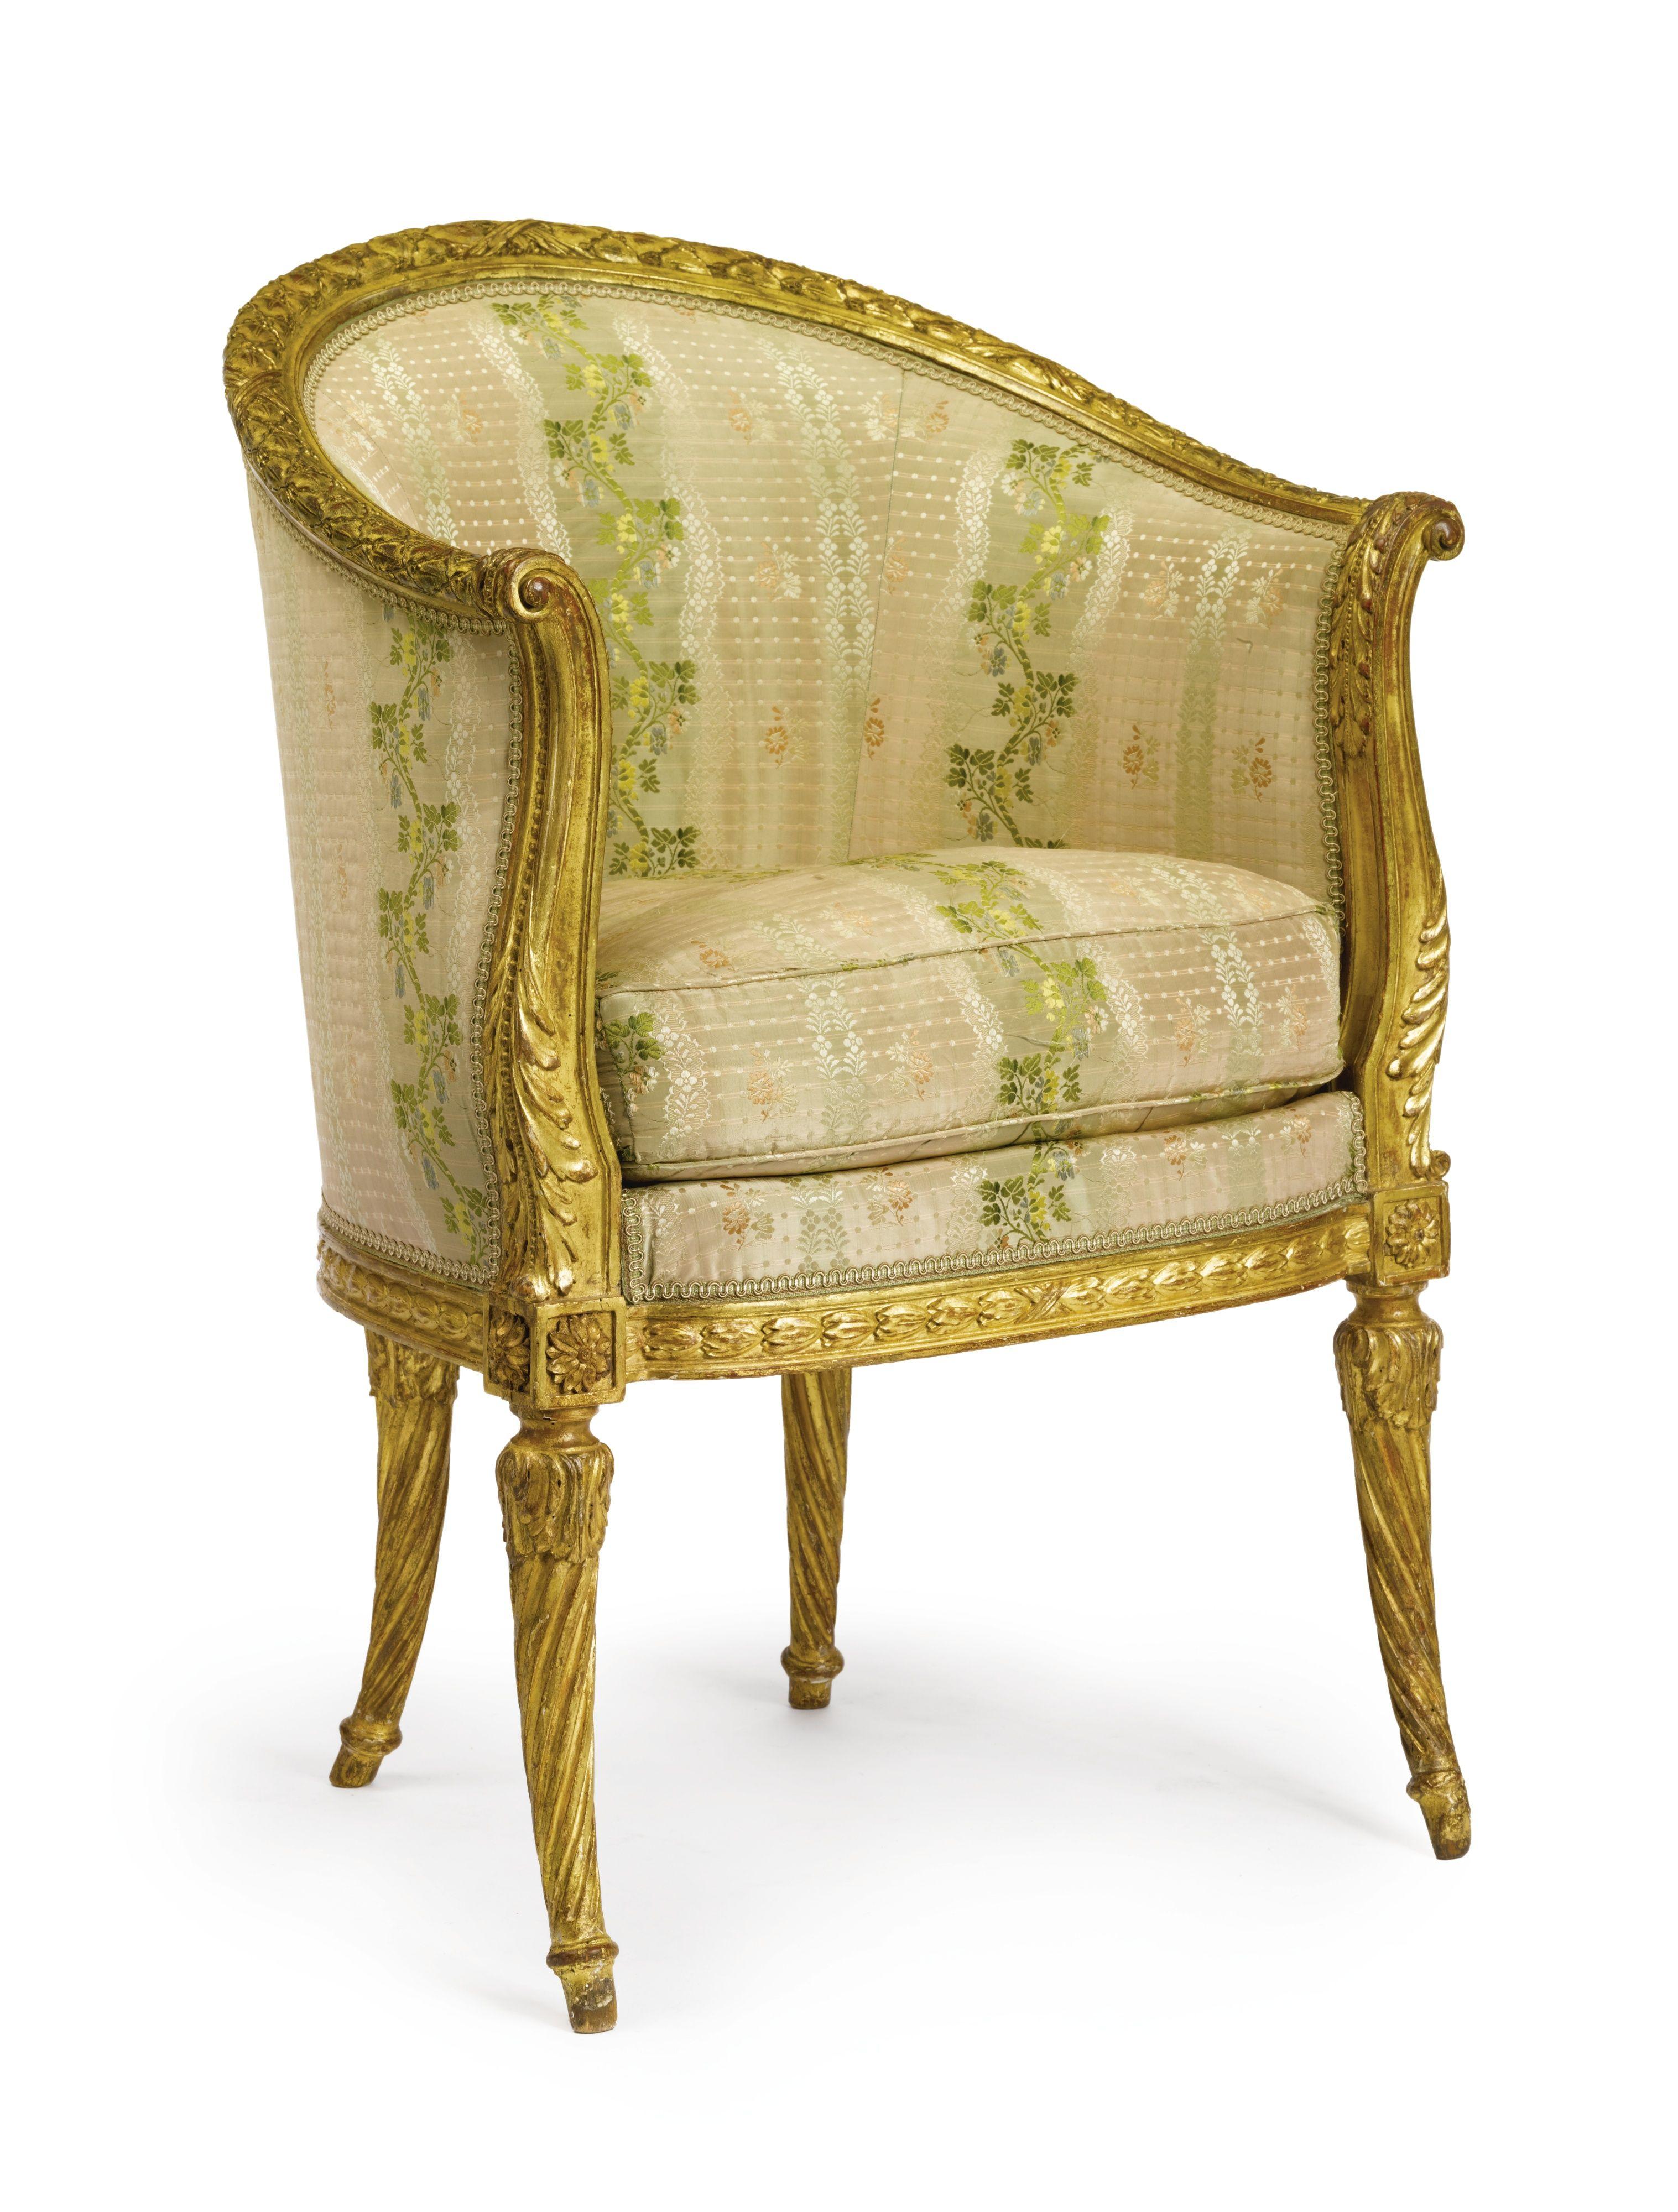 High Quality Antique Chairs · A LOUIS XVI CARVED GILTWOOD BERGÈRE EN GONDOLE LAST  QUARTER 18TH CENTURY Struck Beneath The Seat